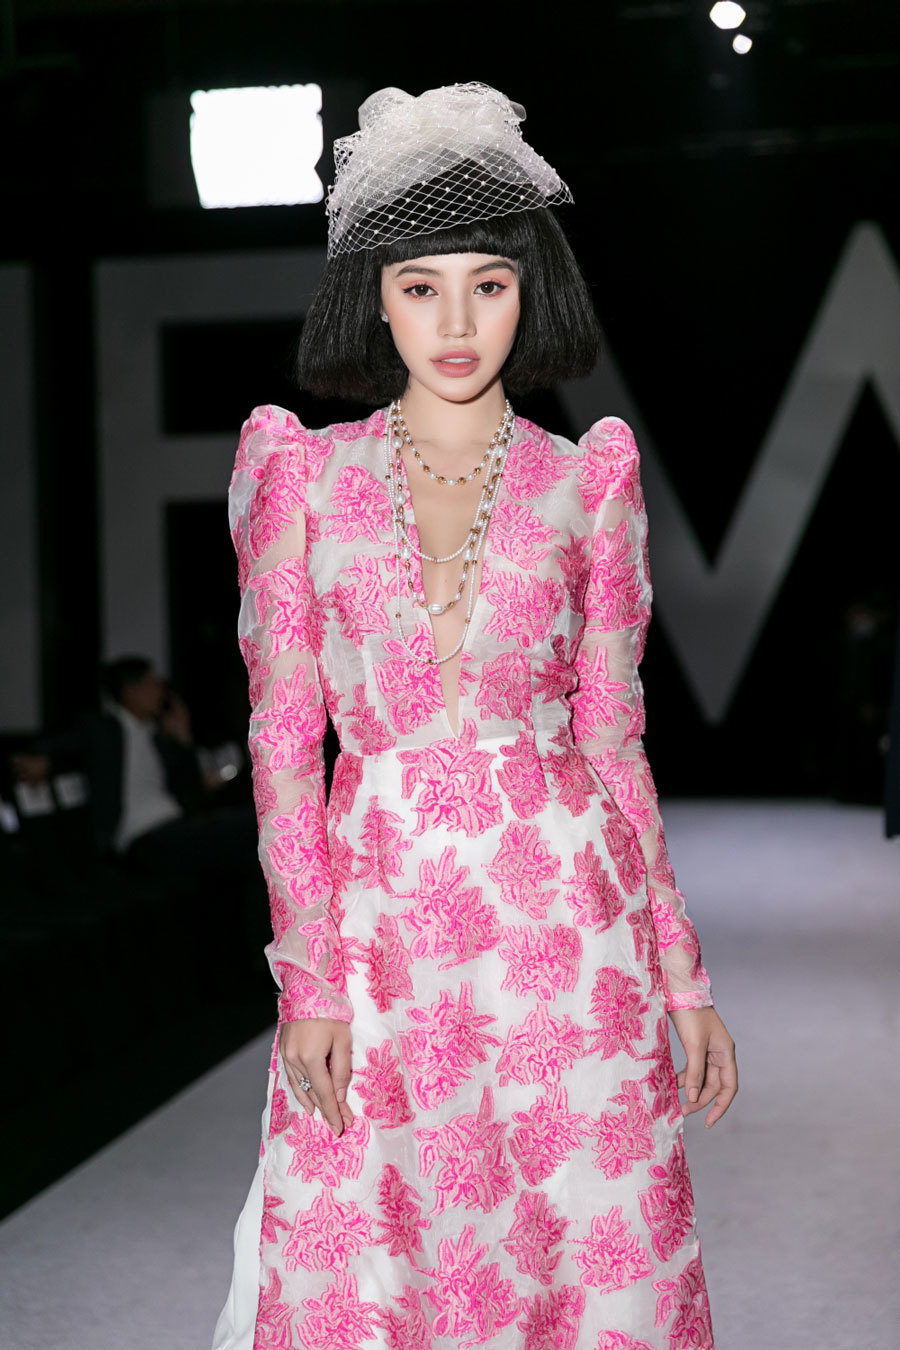 Jolie Nguyễn